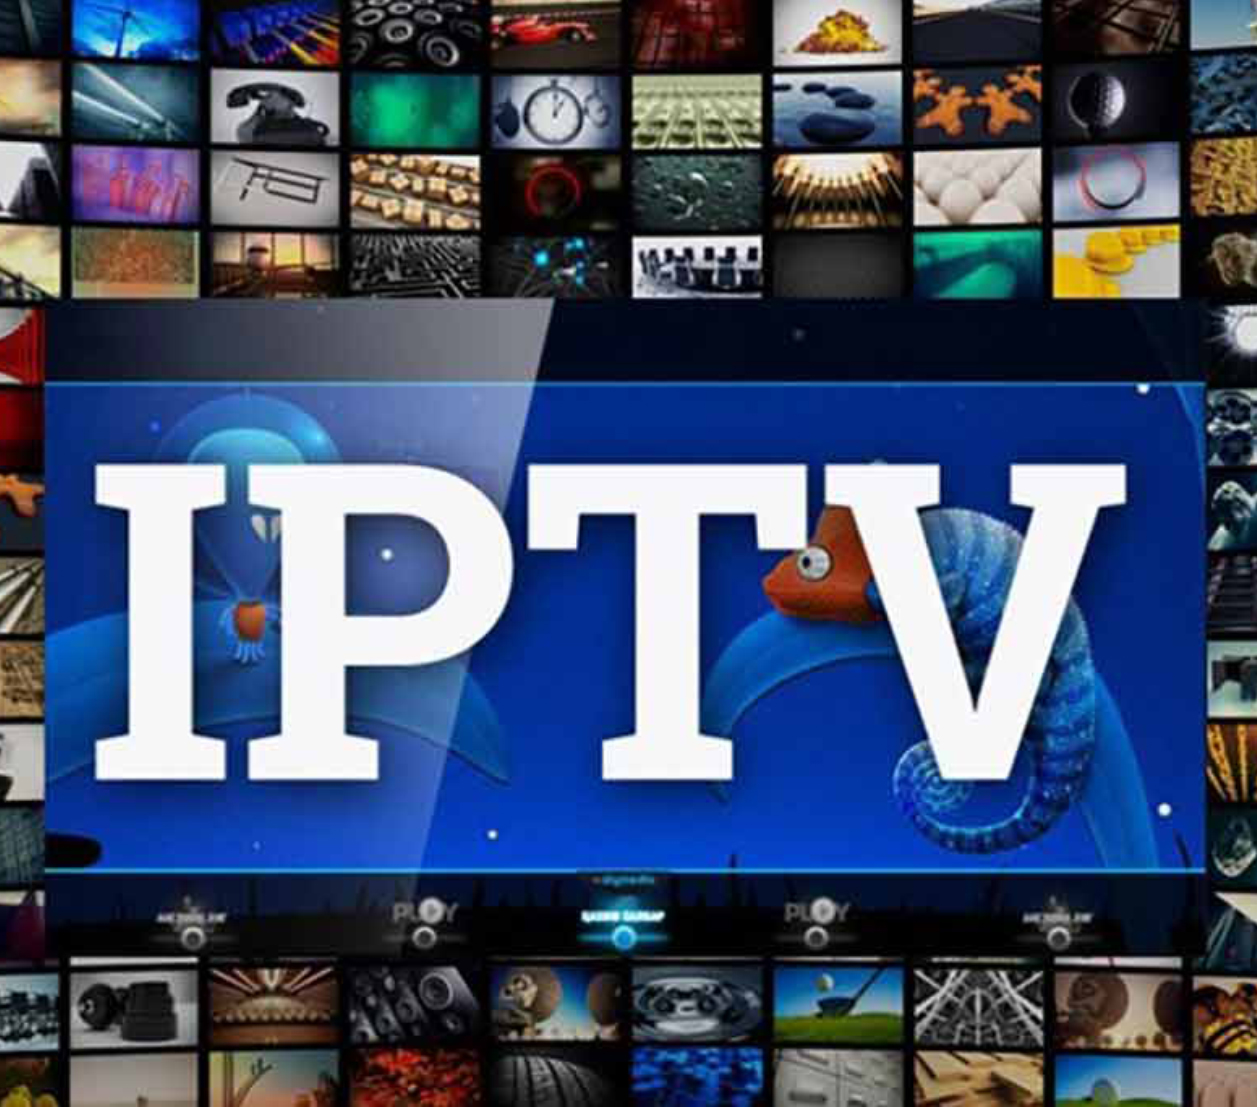 Телевидение (IP TV)*